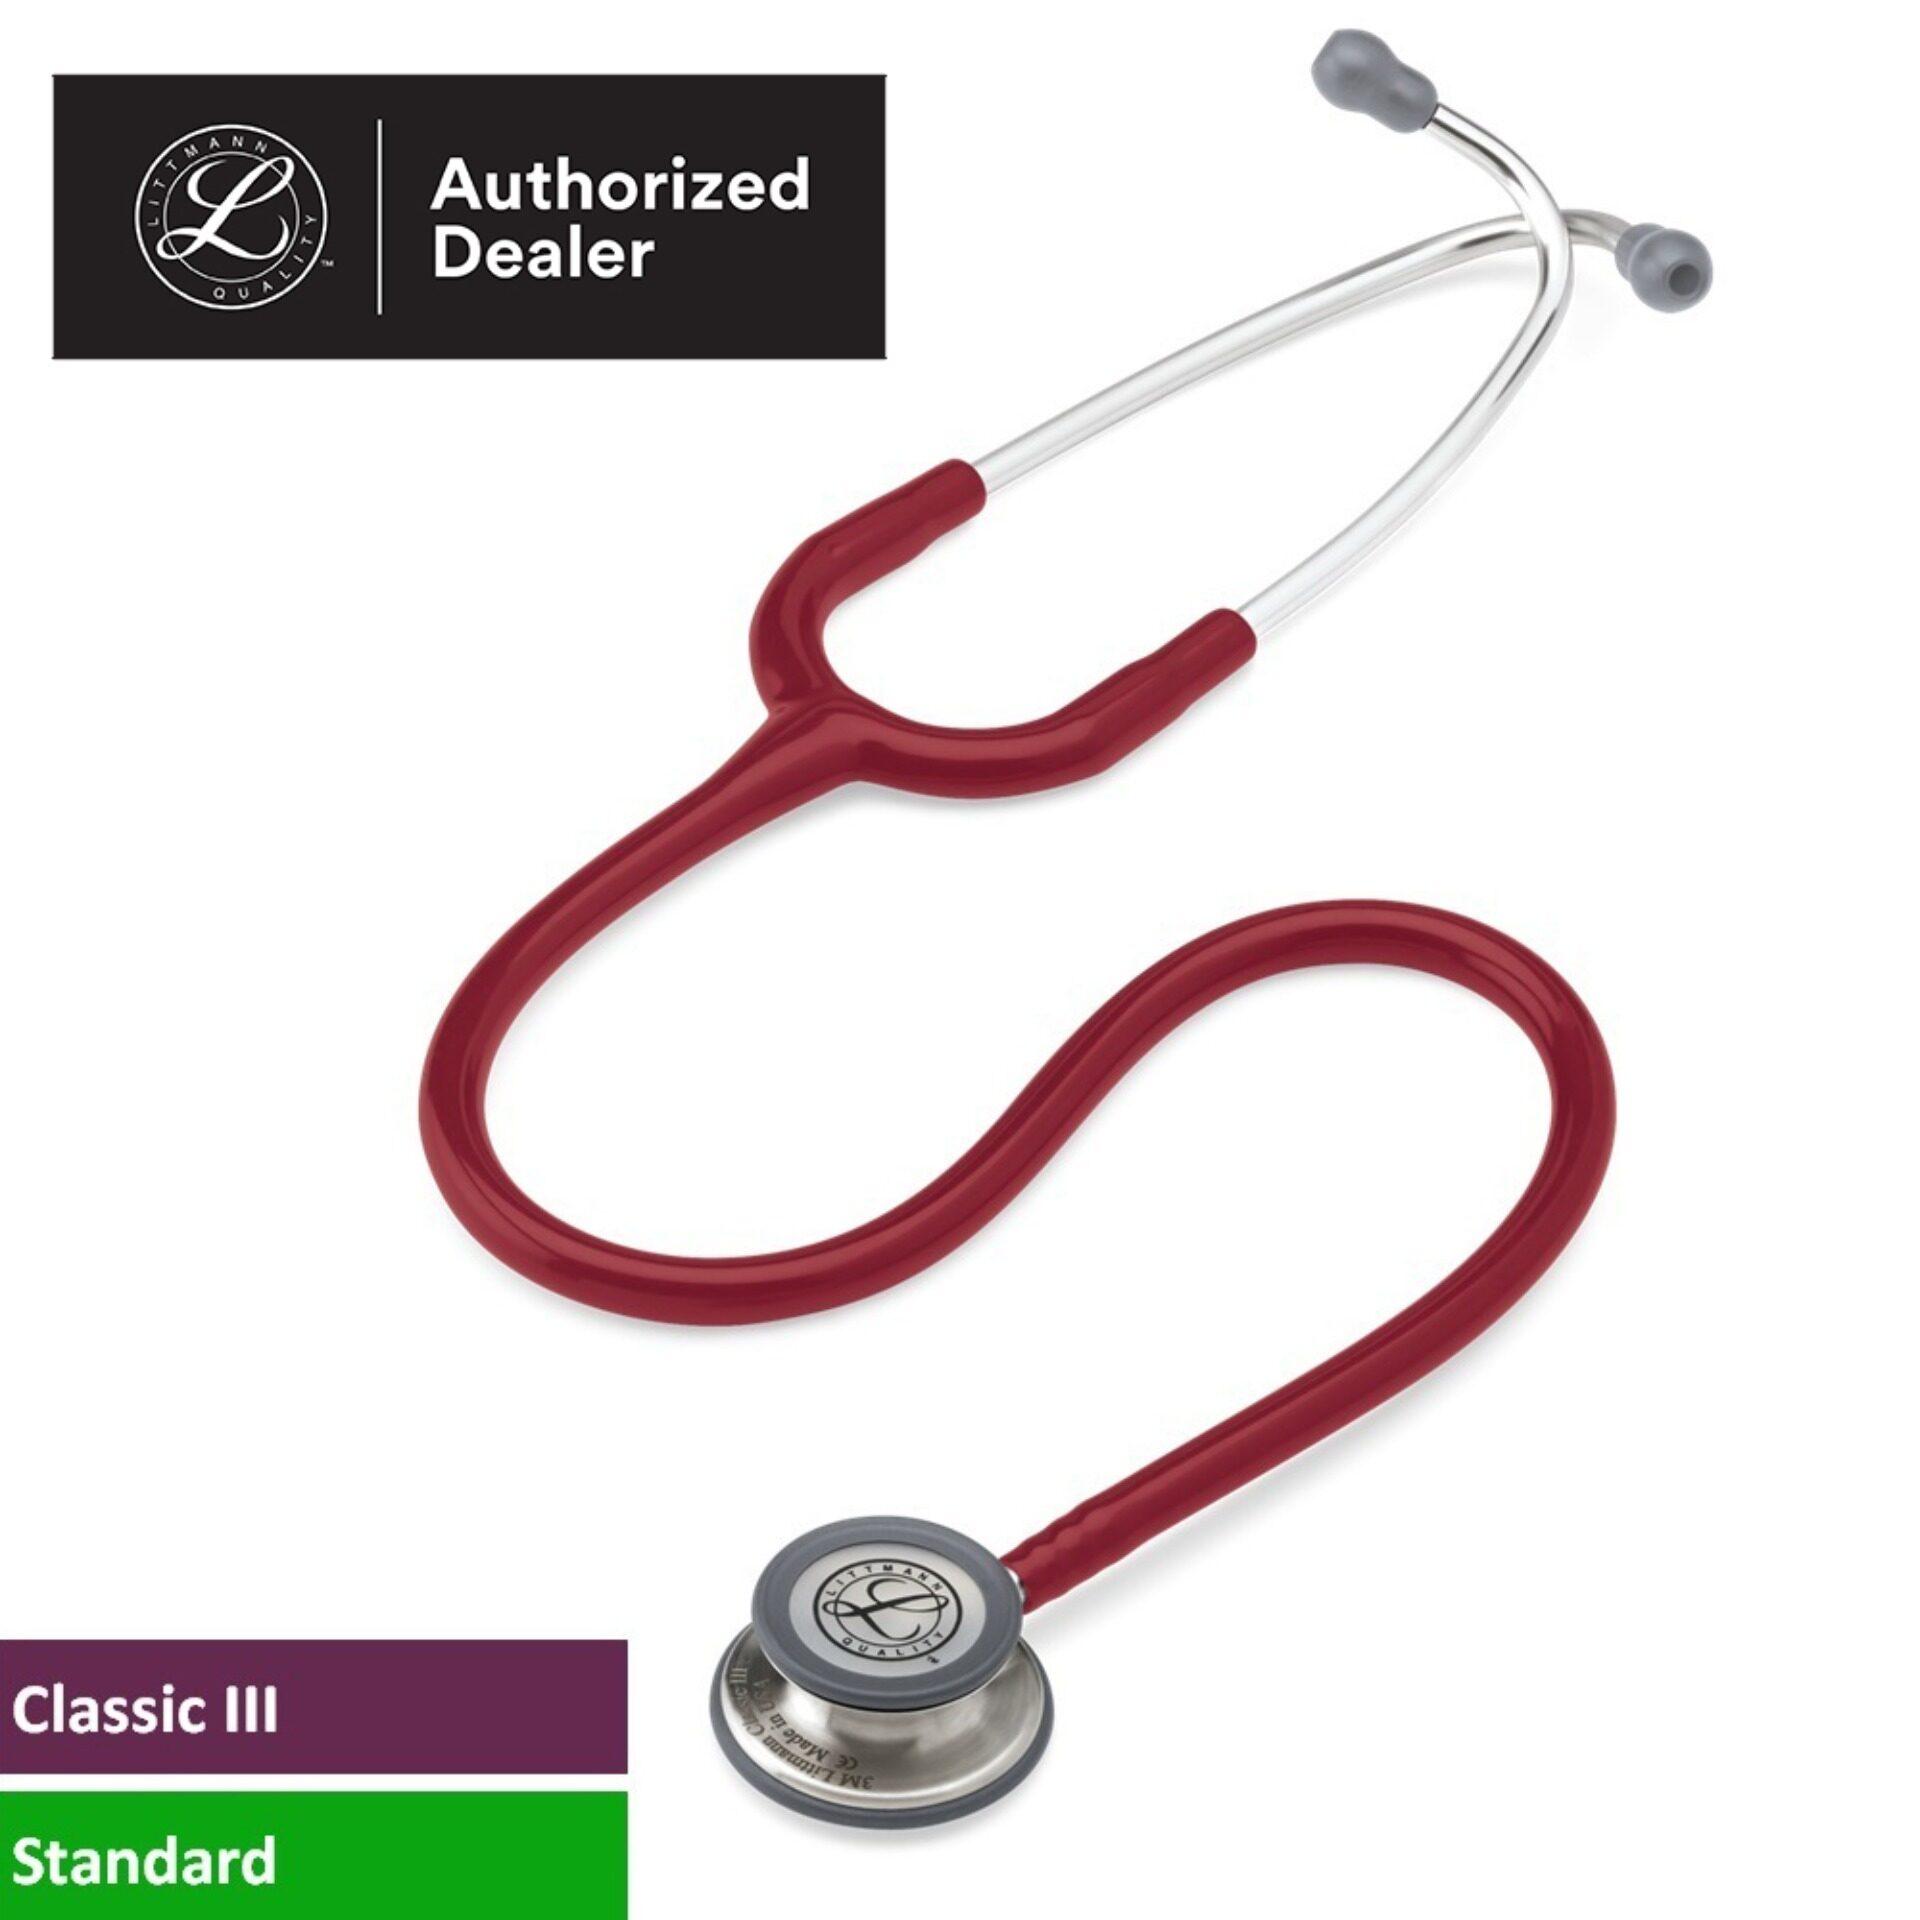 3M Littmann Classic III Stethoscope, 27 inch, #5627 (Burgundy Tube, Standard-Finish Chestpiece, Stainless Stem & Eartubes)